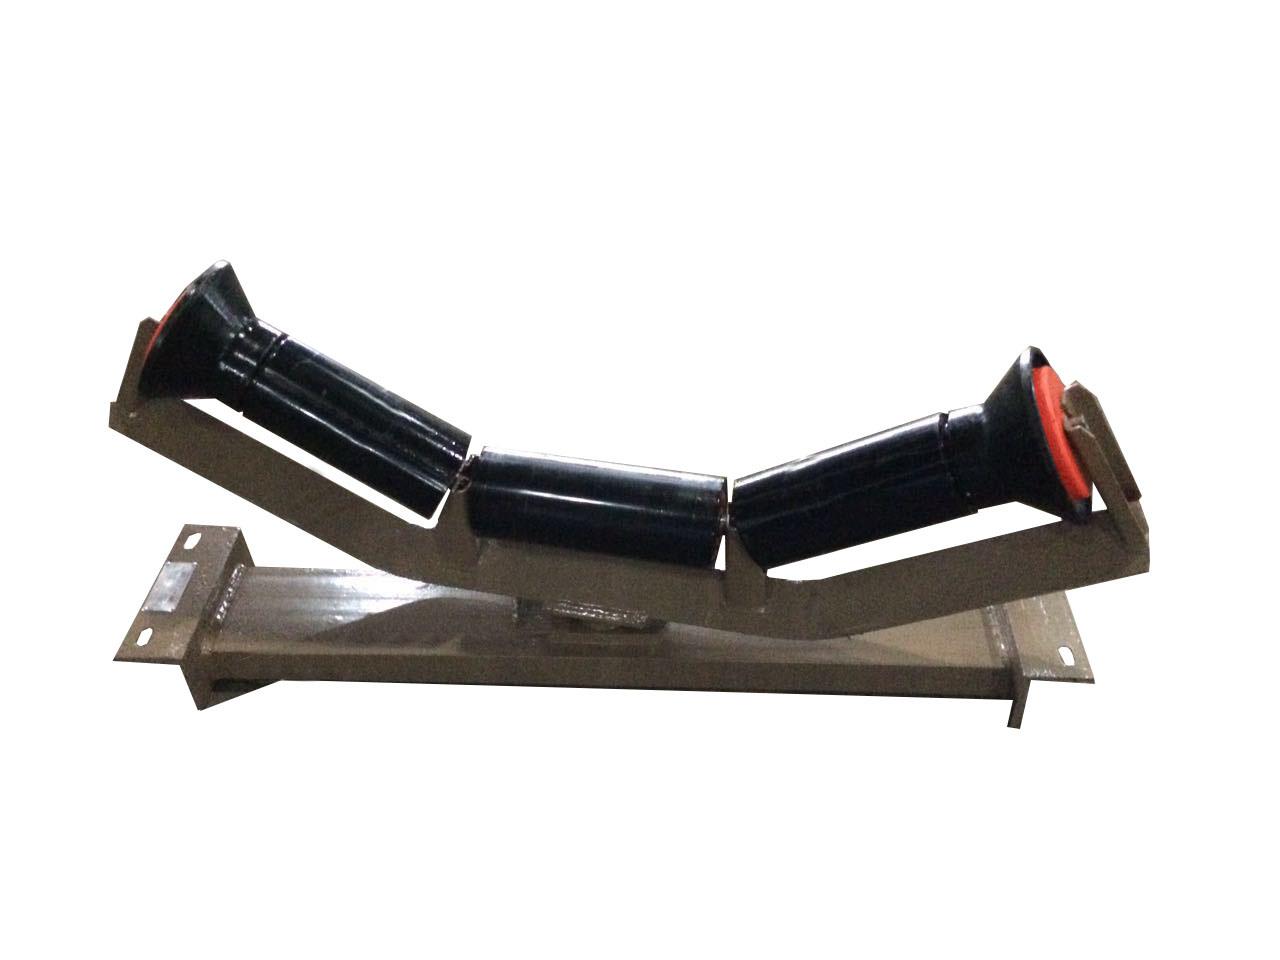 Carrier Self Aligning Roller Group for Belt Conveyor Zds-S